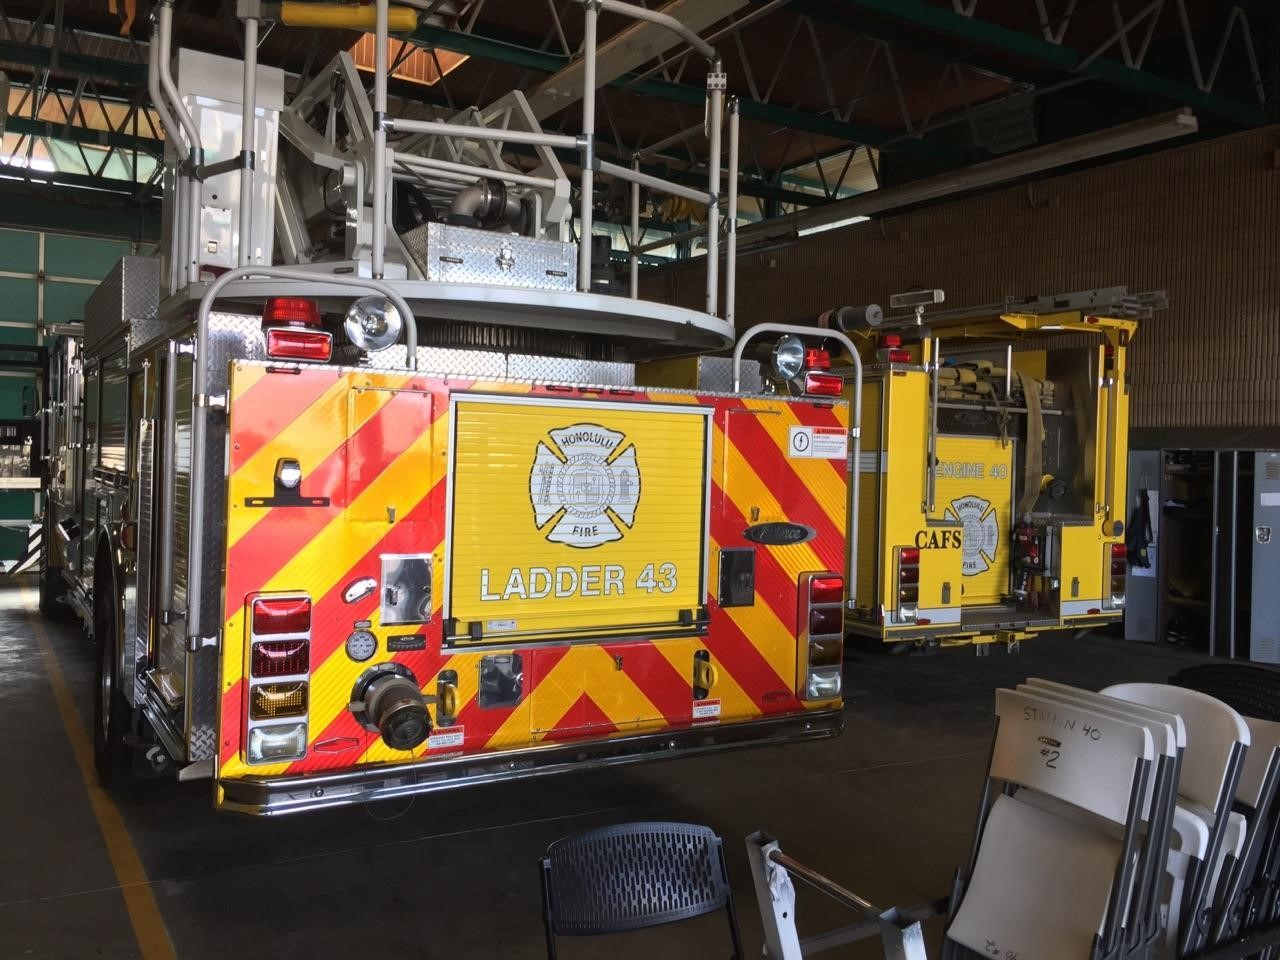 honolulu-fire-truck-ladder-43-truck_180927